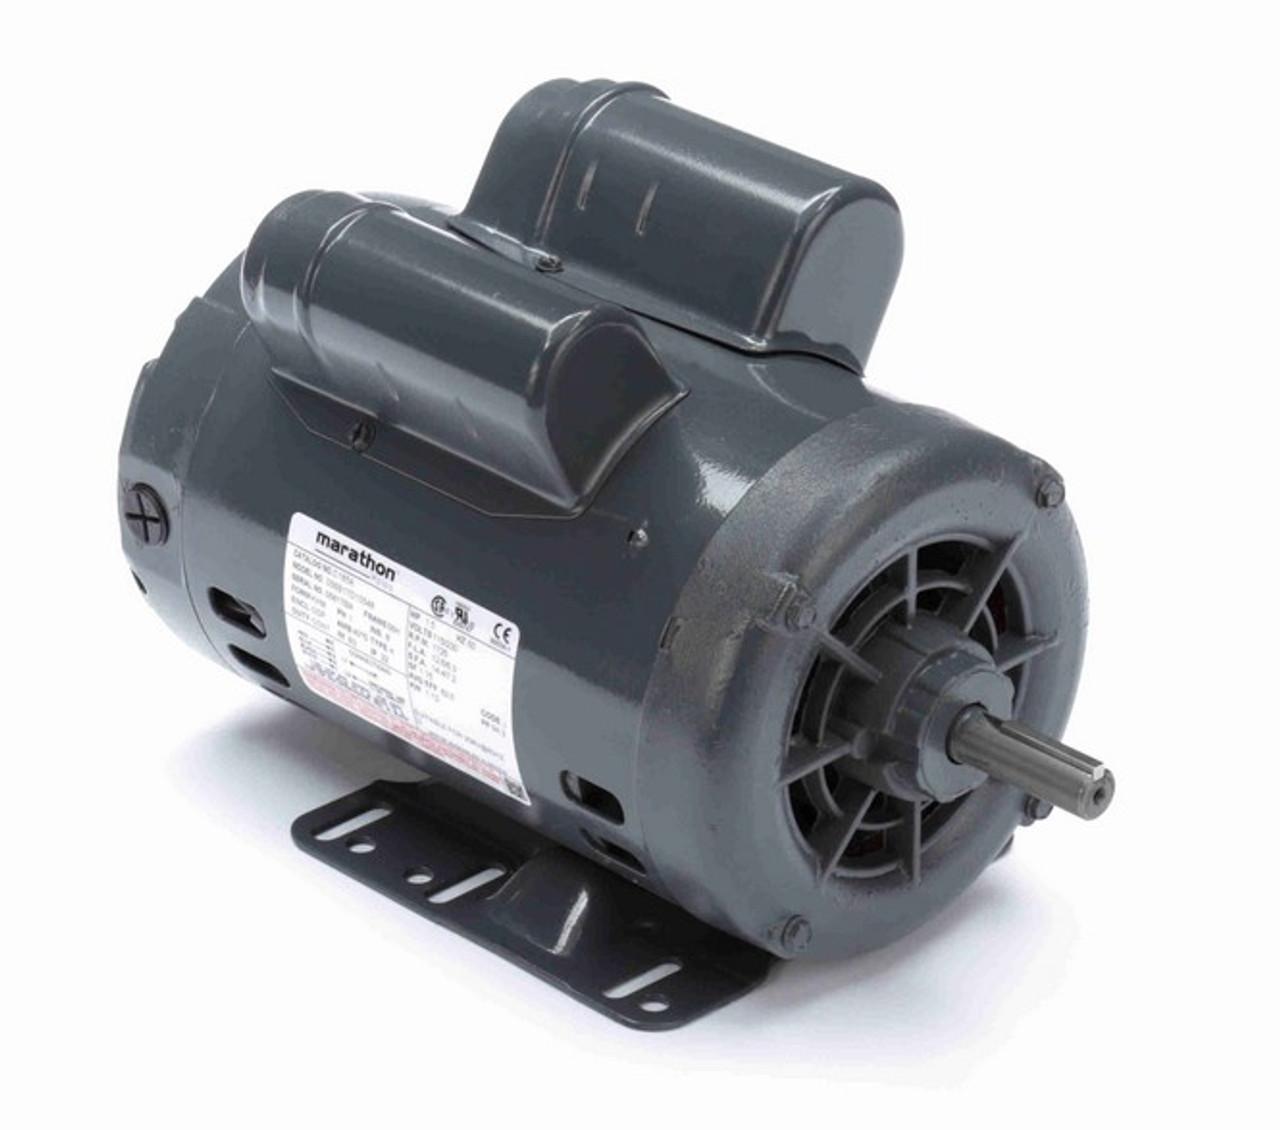 Marathon 1.5 Hp Electric Motor Wiring Diagram from cdn11.bigcommerce.com